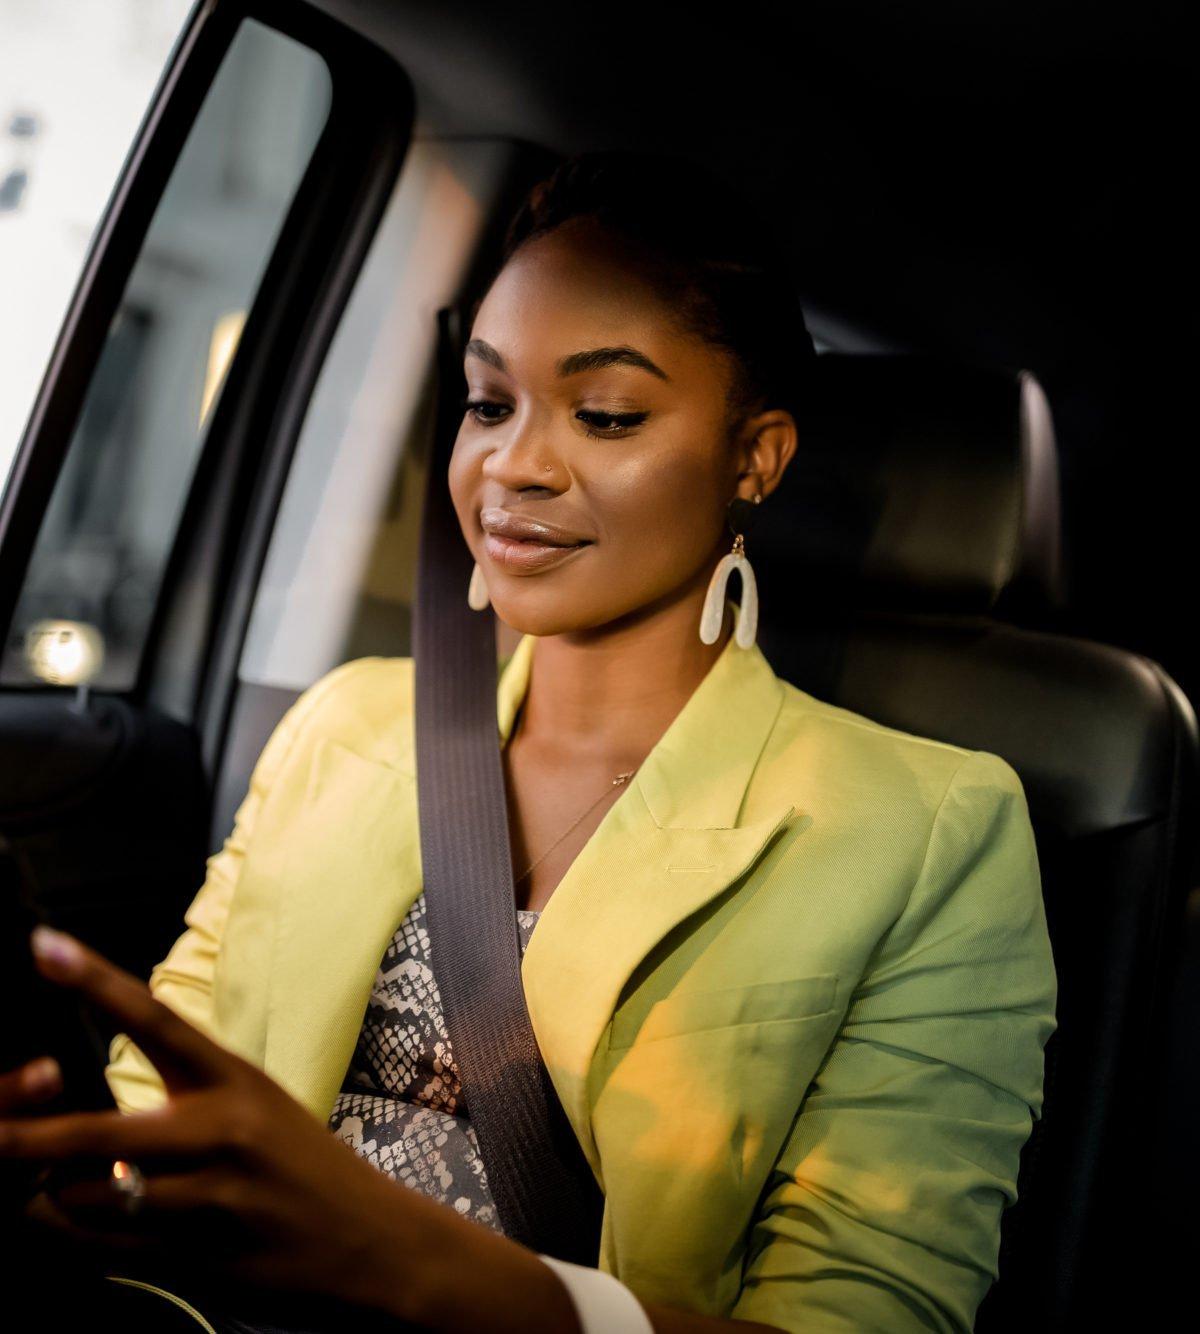 Ijeoma Kola shares her Uber safety tips